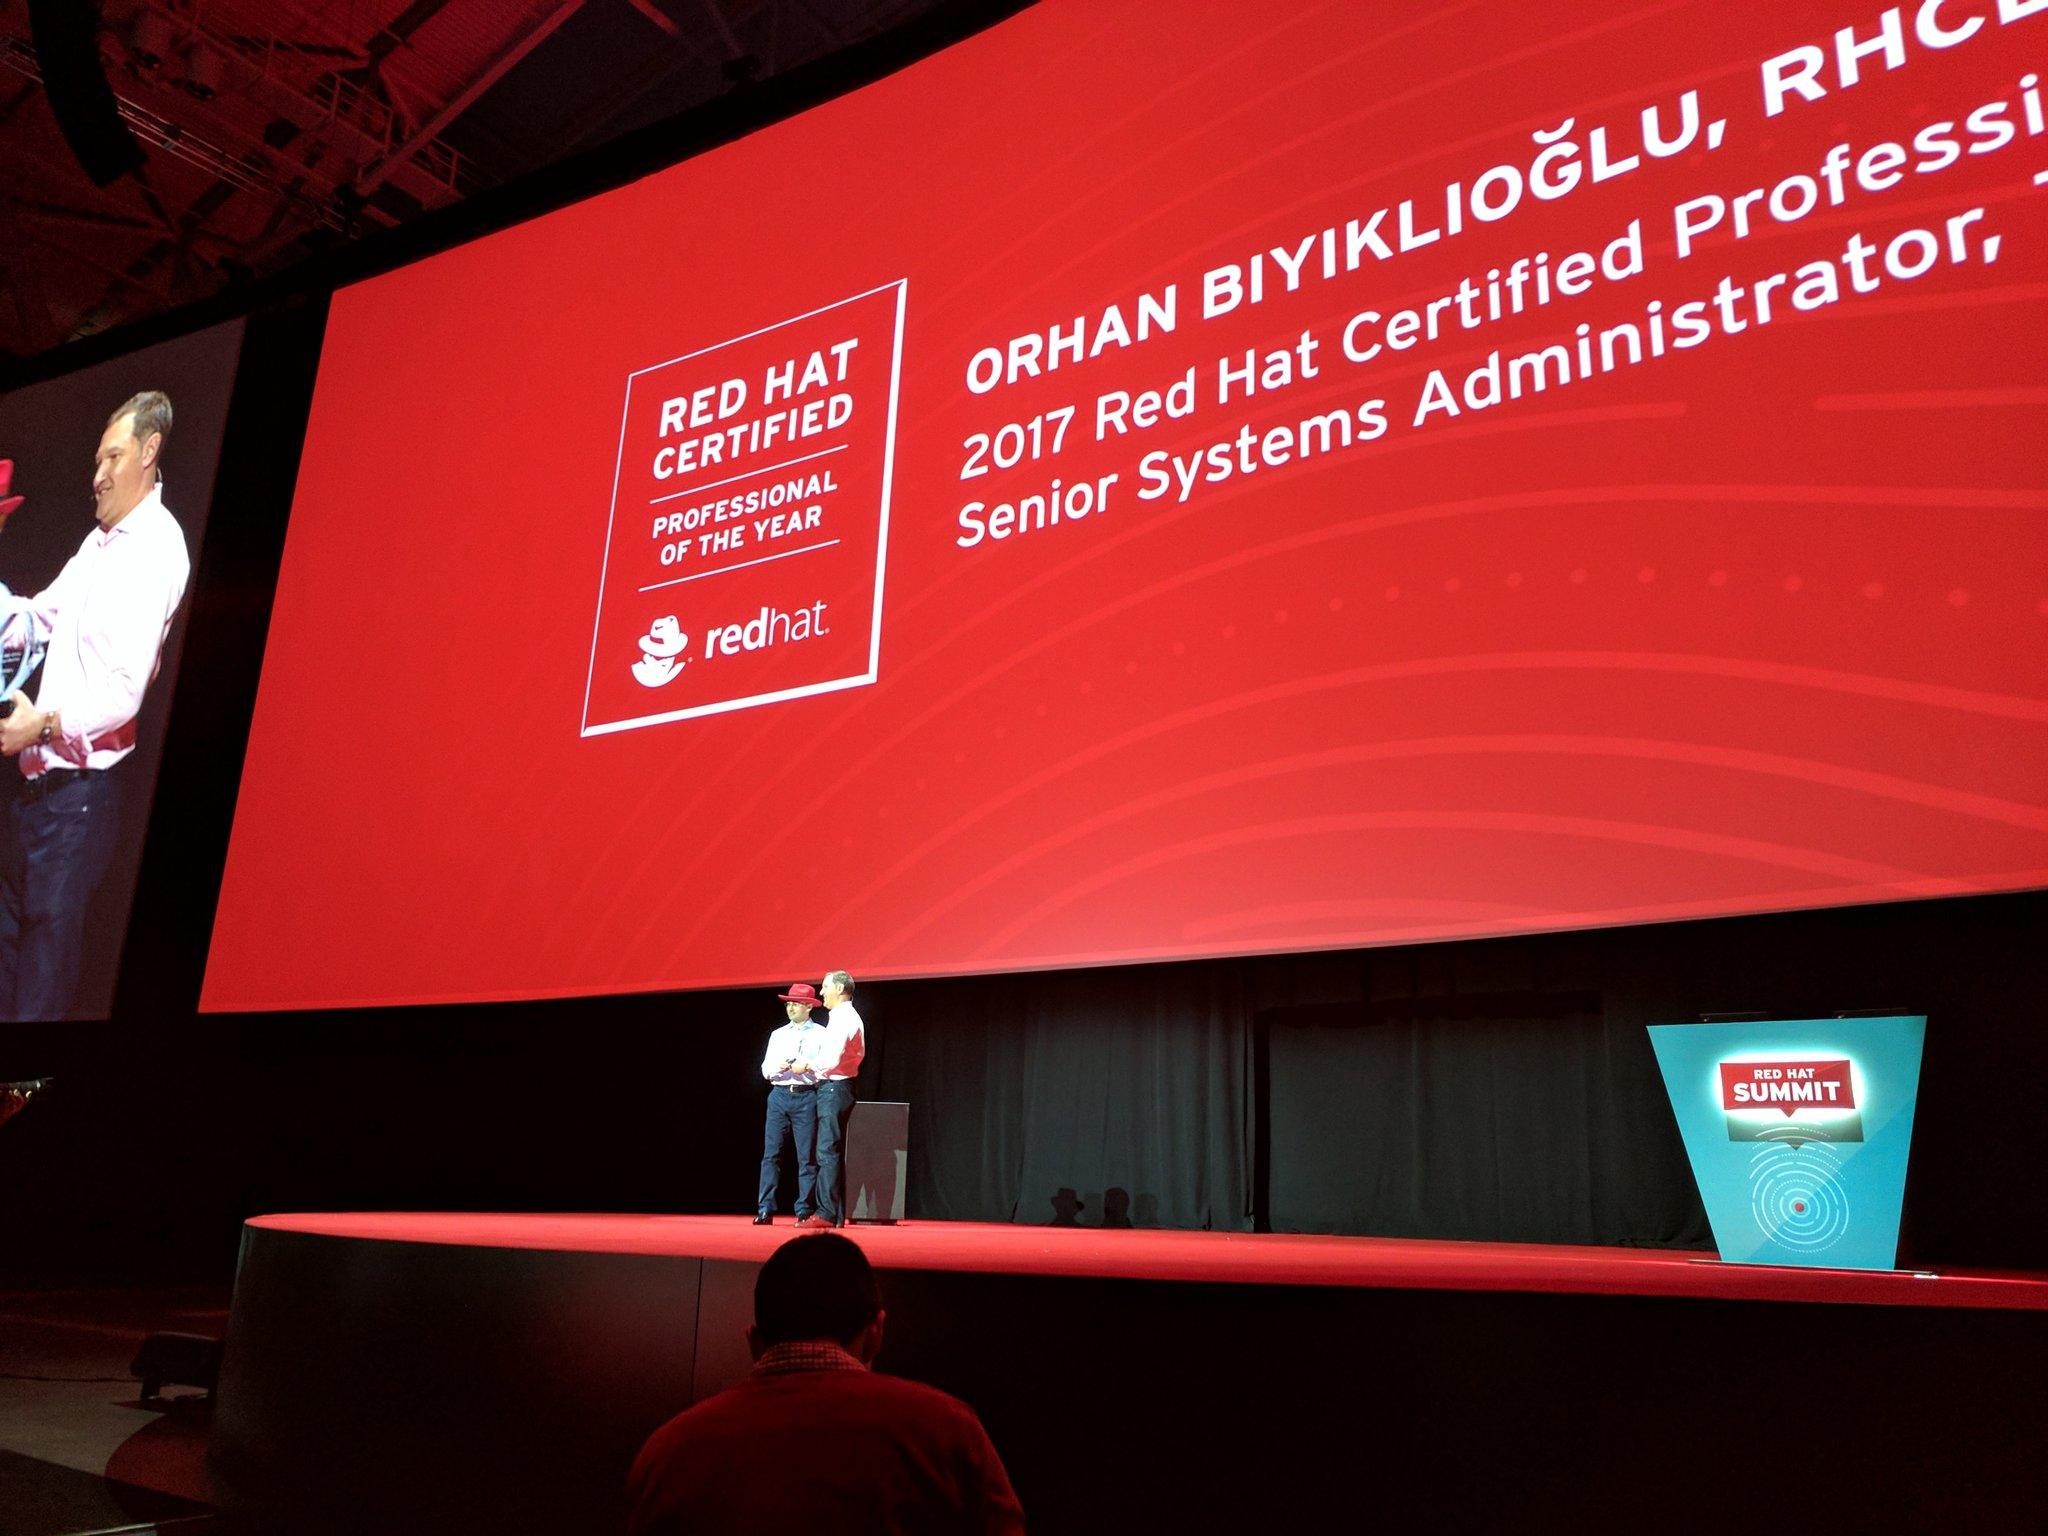 Congrats to @biyiklioglu - @RedHat professional of the Year #RHSummit https://t.co/SjPgvNrStF